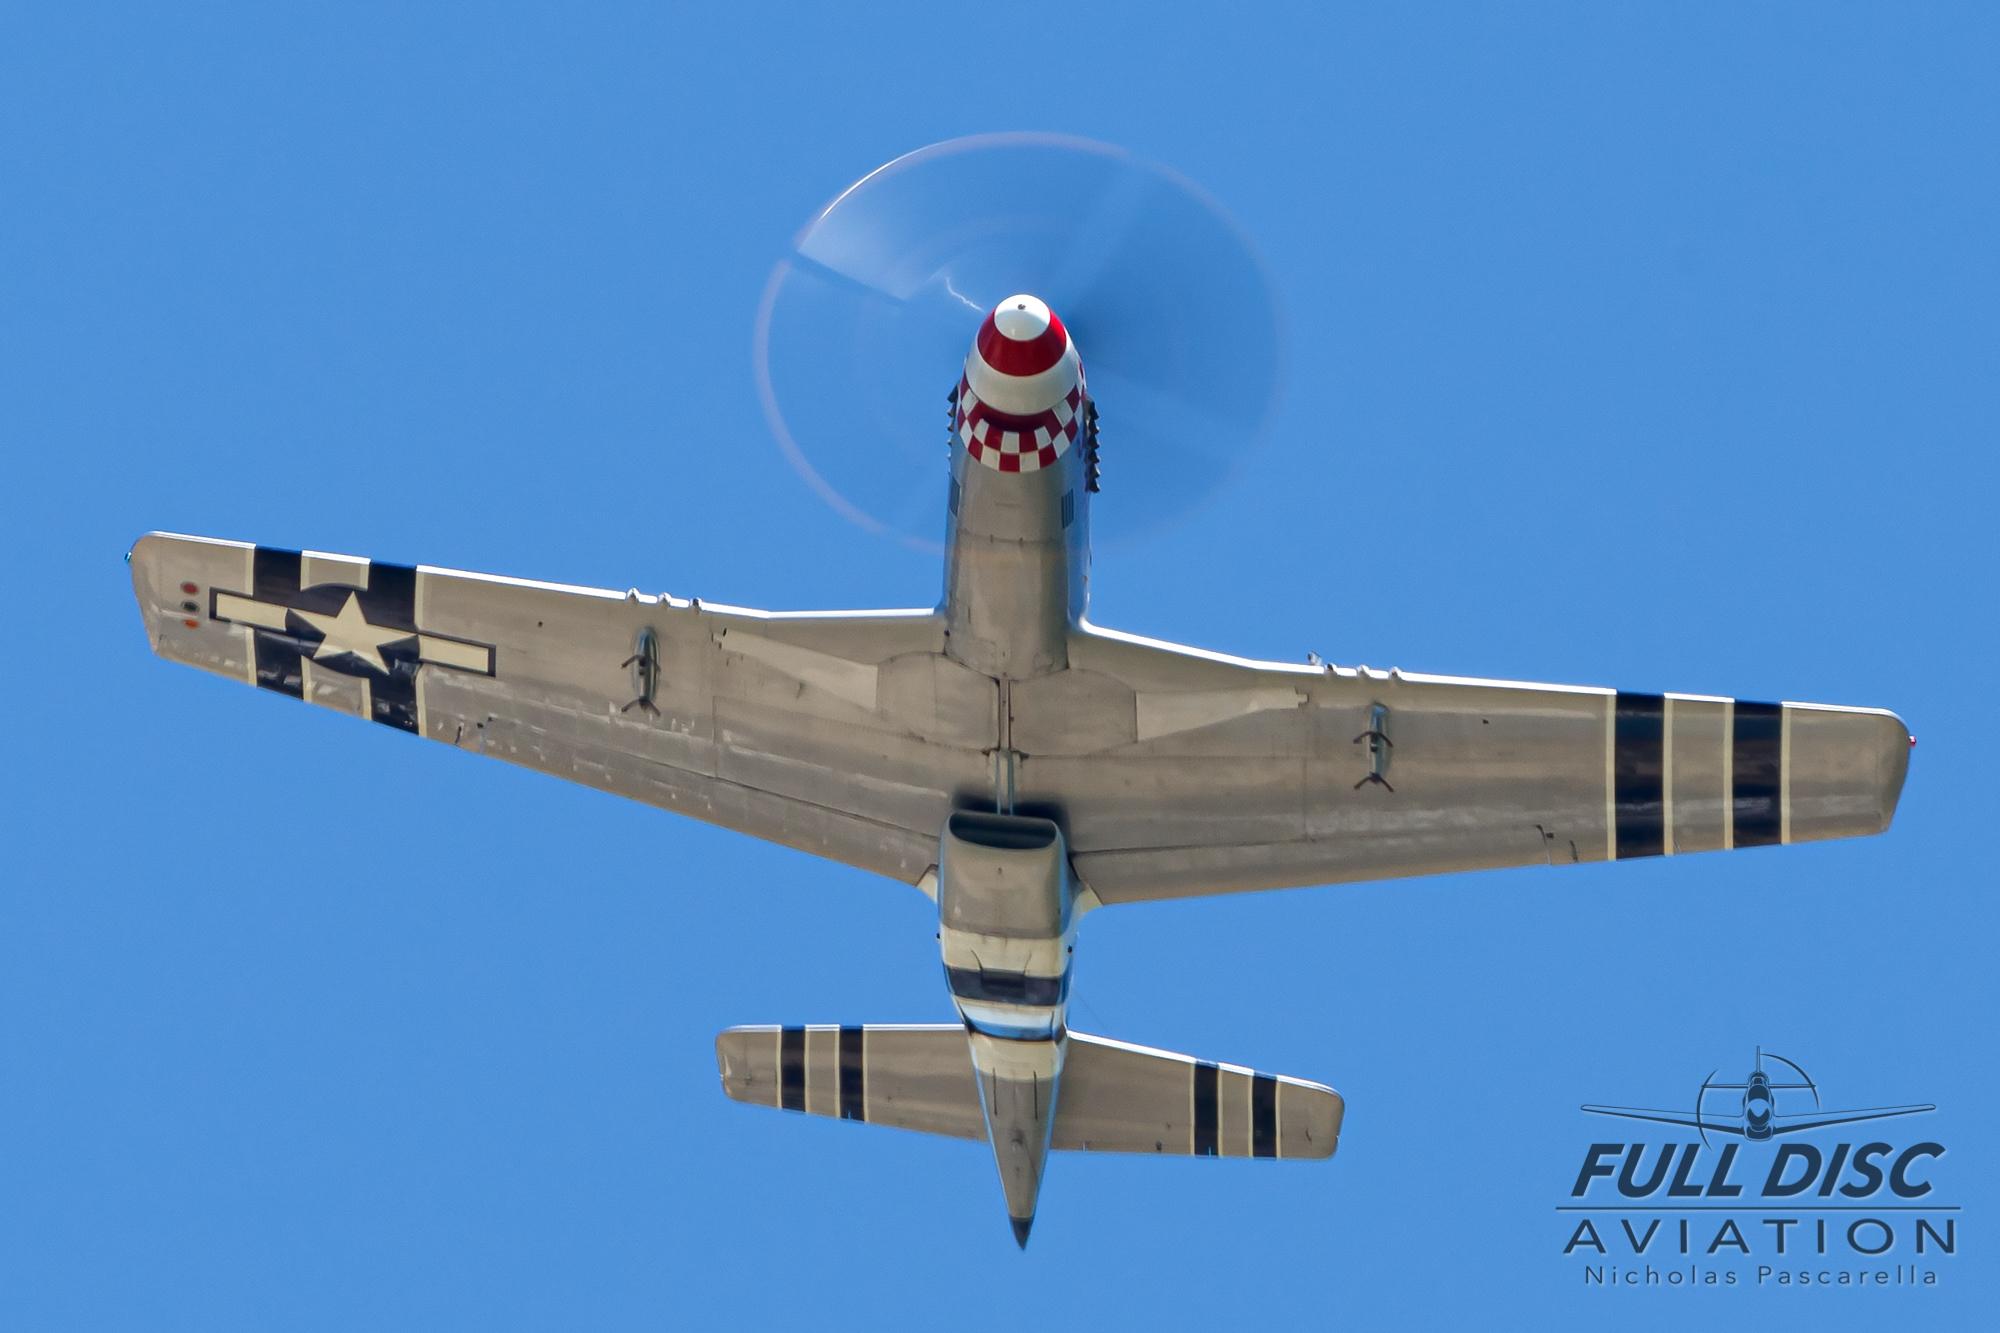 americanairpowermuseum_nicholaspascarella_nickpascarella_fulldiscaviation_legendsofairpower2019_aviation_warbird_p51_mustang_overhead_fighteraircraft.jpg